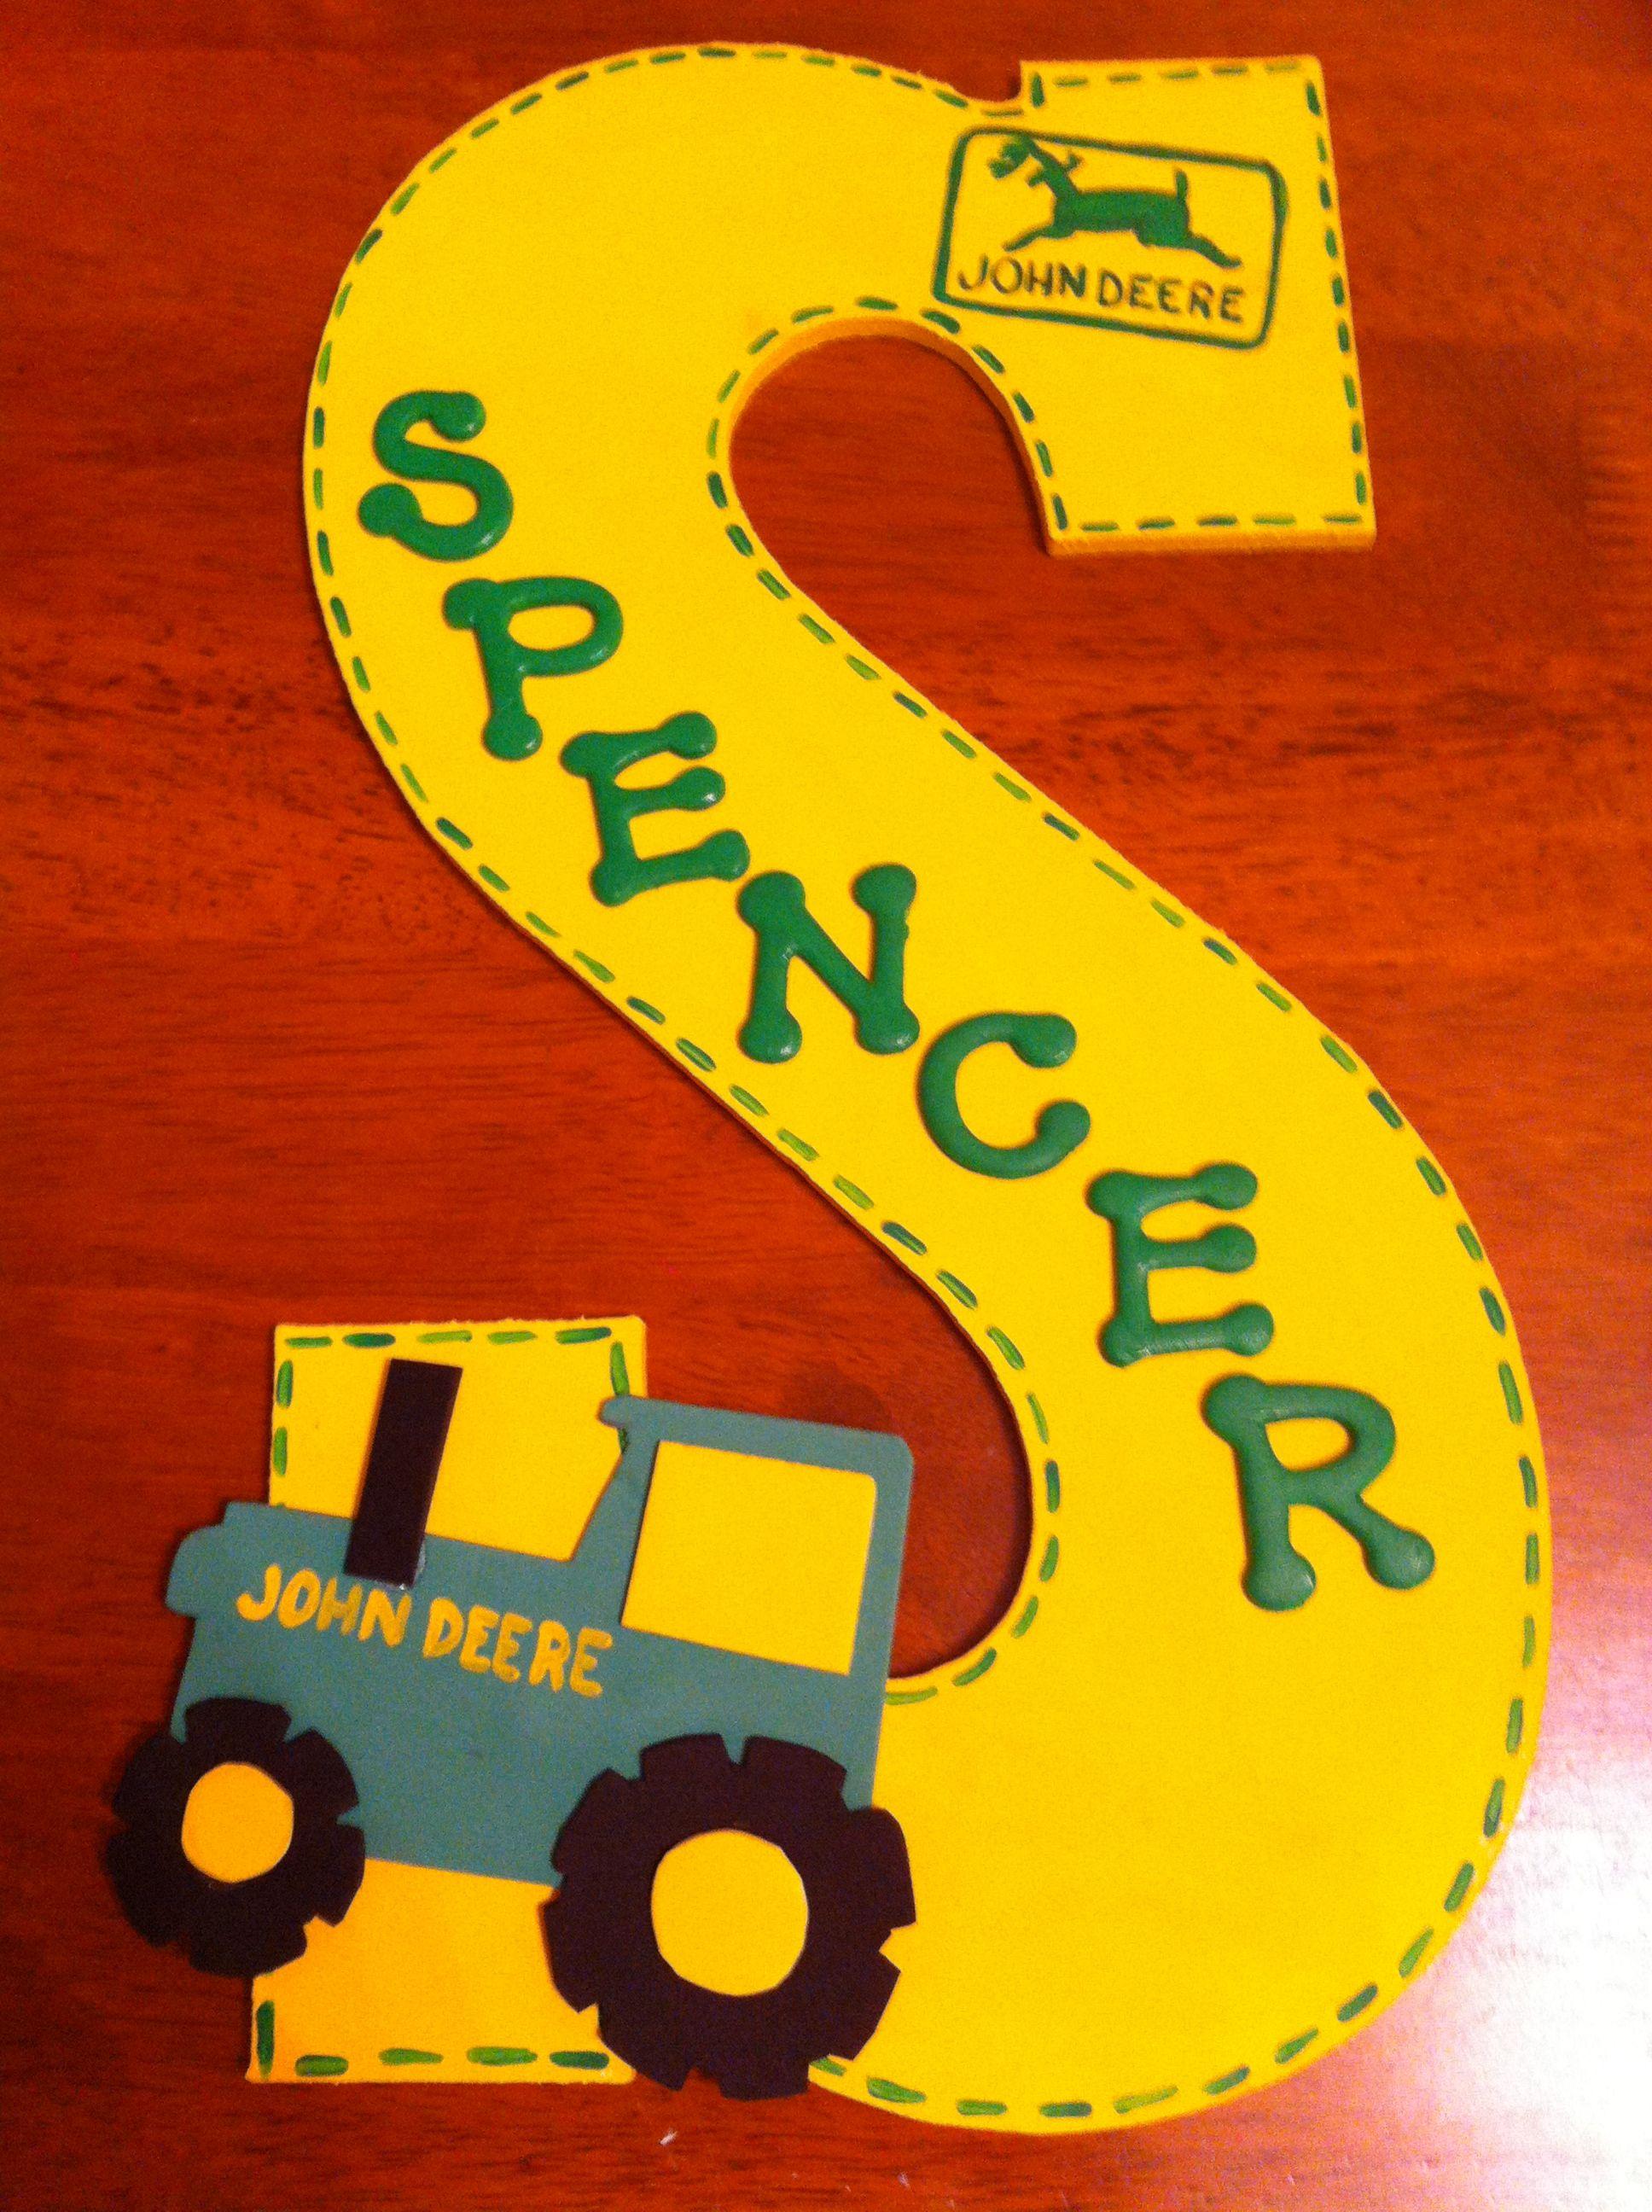 John Deere. Personalized Homemade DIY Nursery decor Wall letters ...